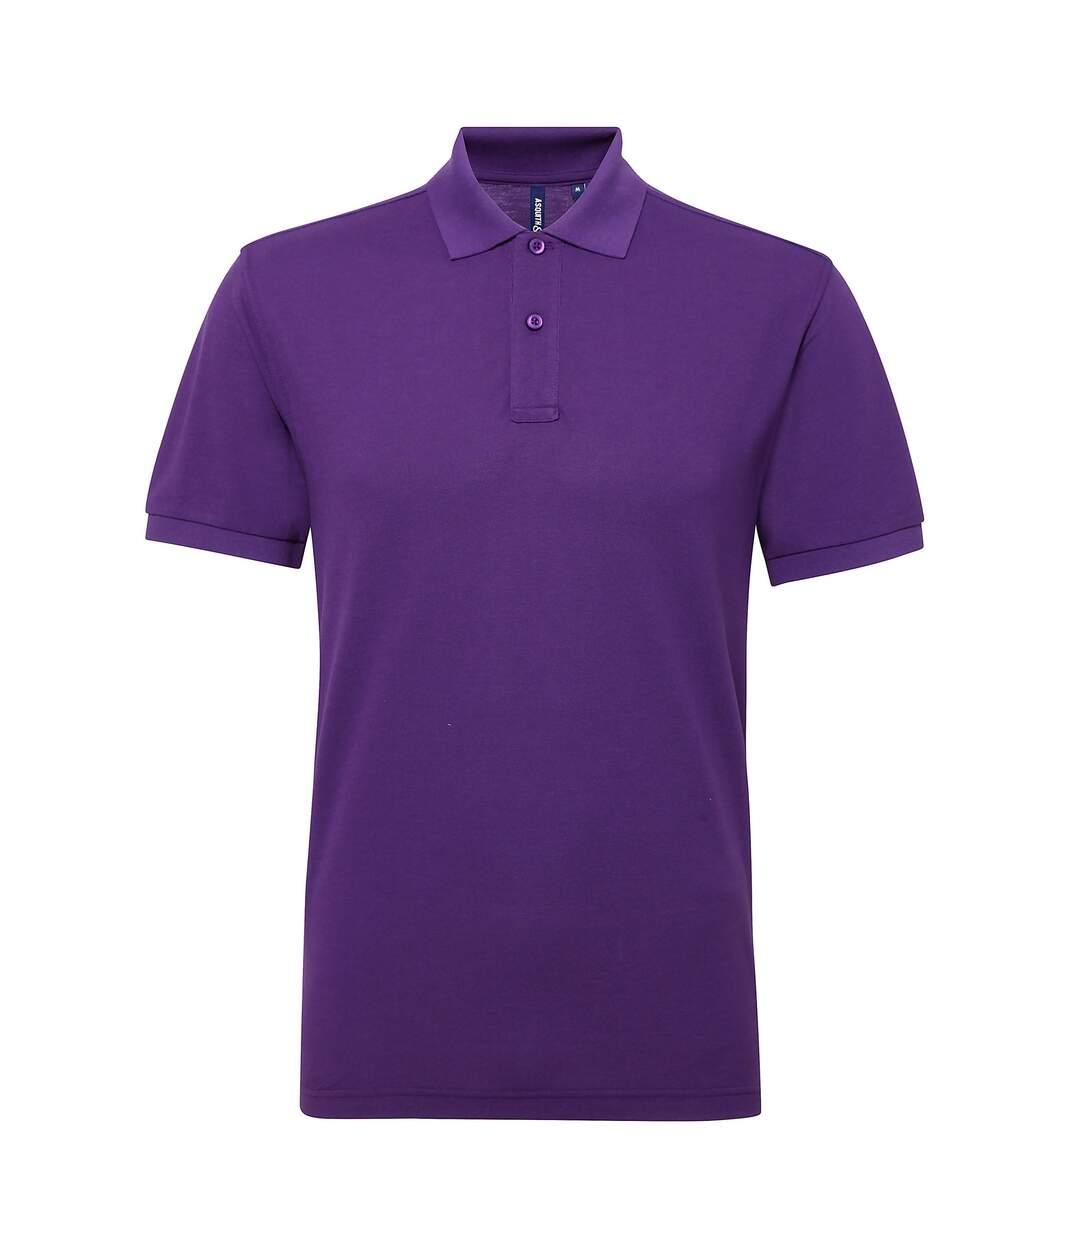 Asquith & Fox Mens Short Sleeve Performance Blend Polo Shirt (Royal) - UTRW5350